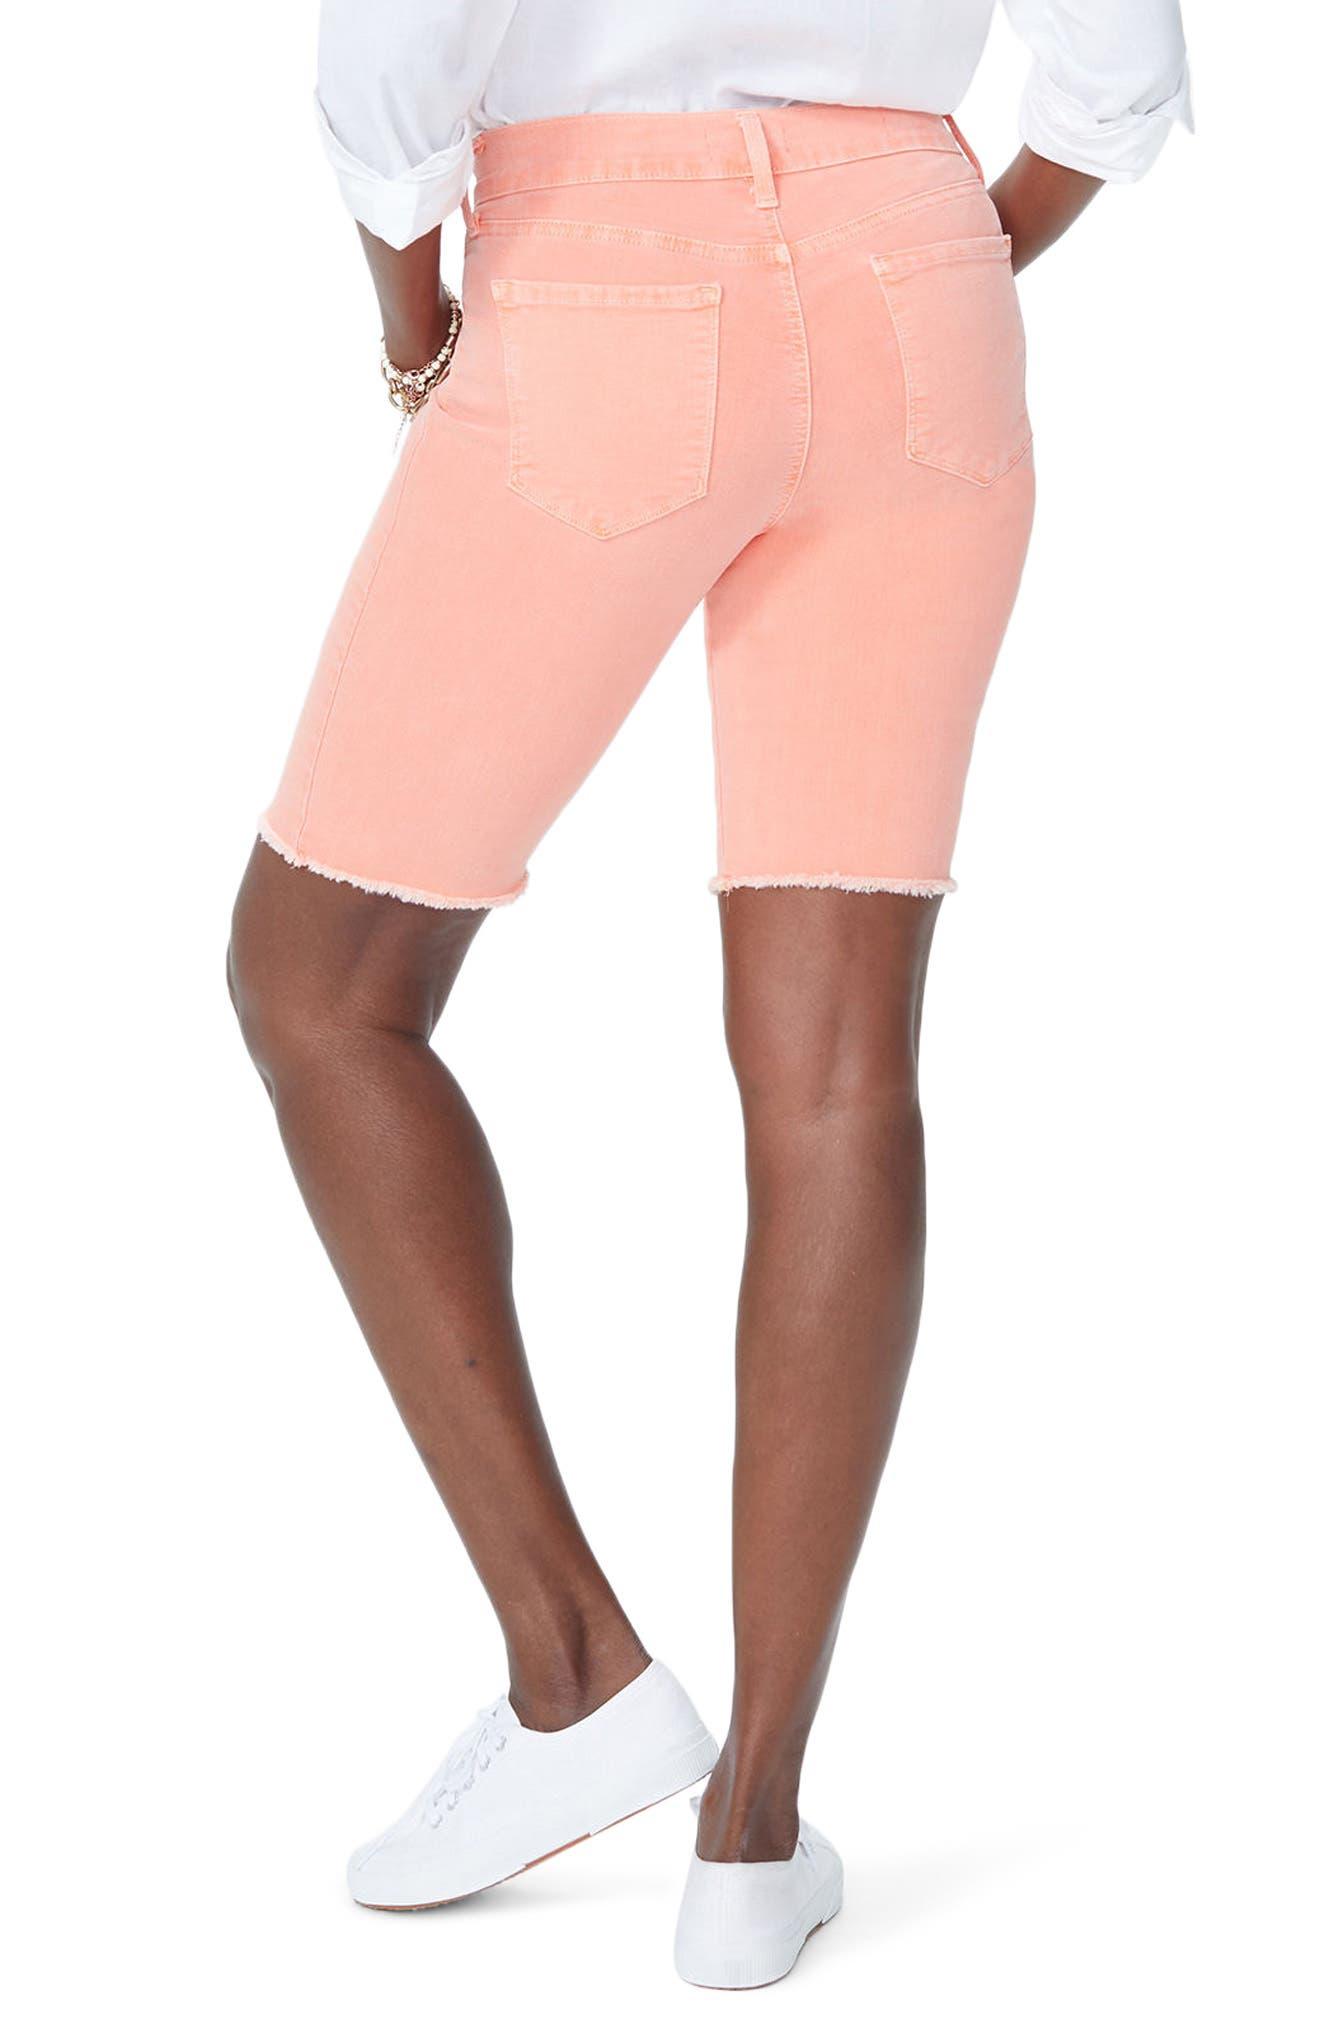 Briella Frayed Hem Bermuda Shorts,                             Alternate thumbnail 2, color,                             Pale Desert Flower